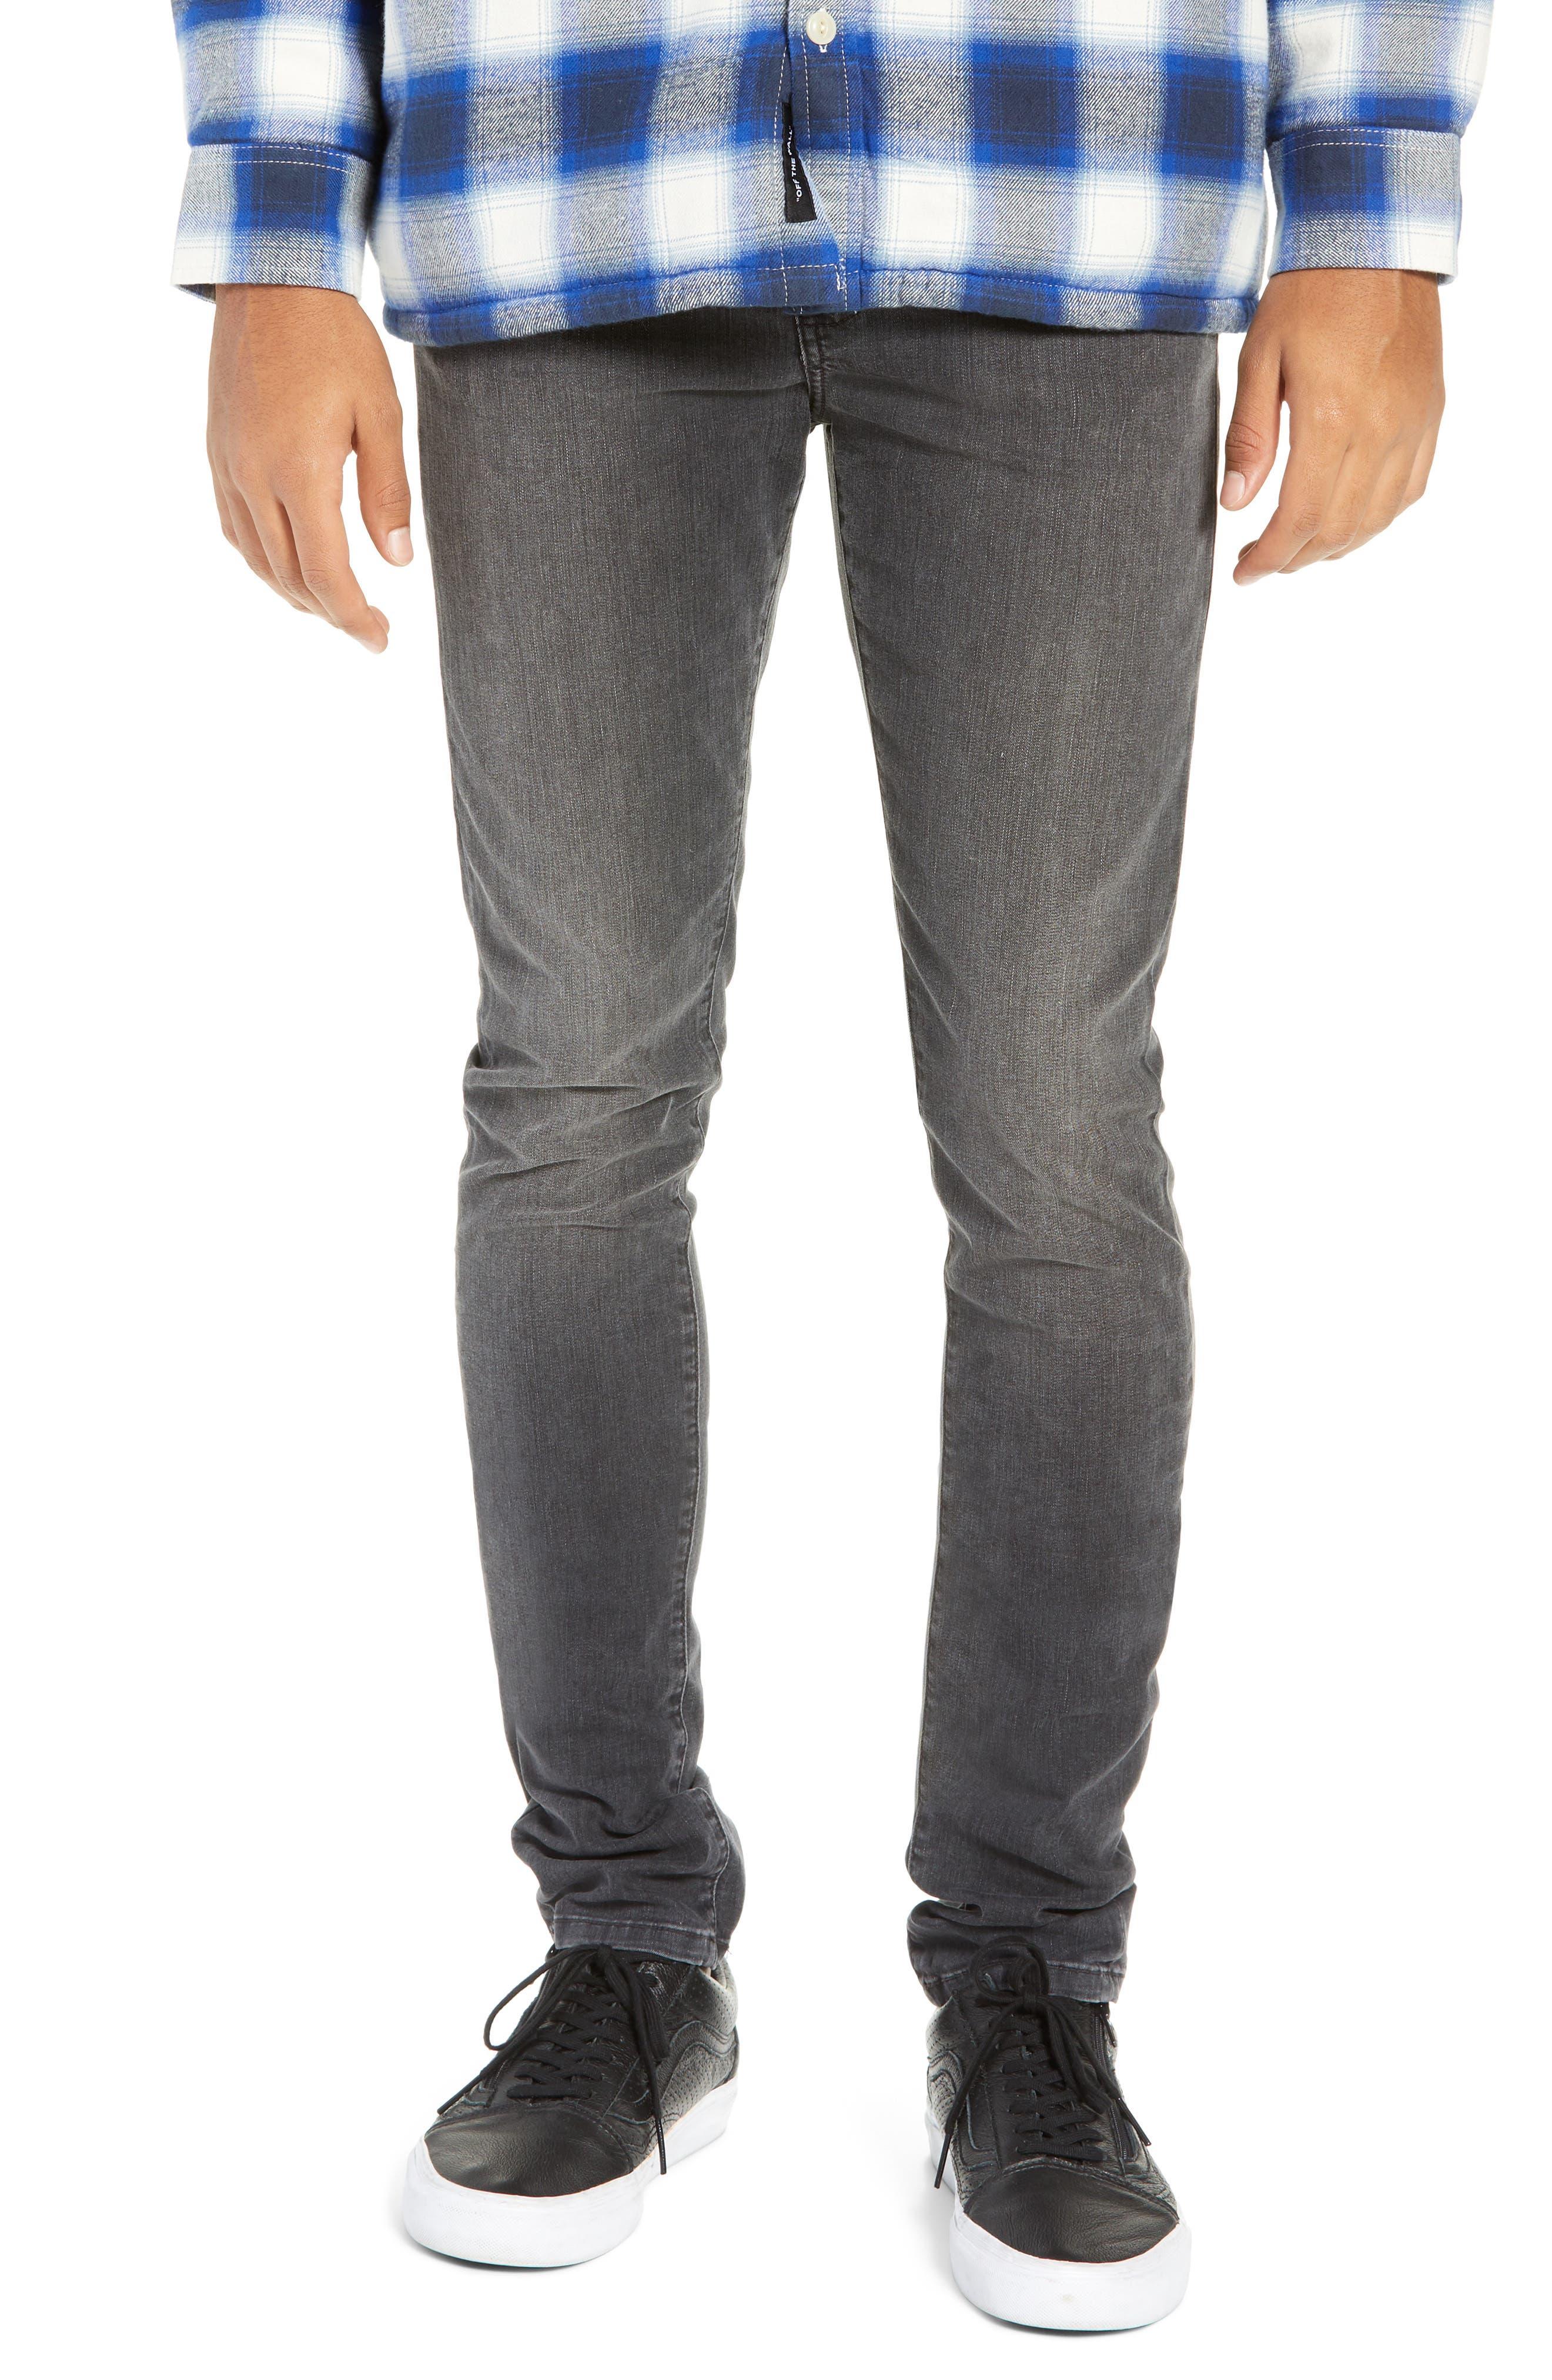 MONFRERE Greyson Skinny Fit Jeans in Berlin